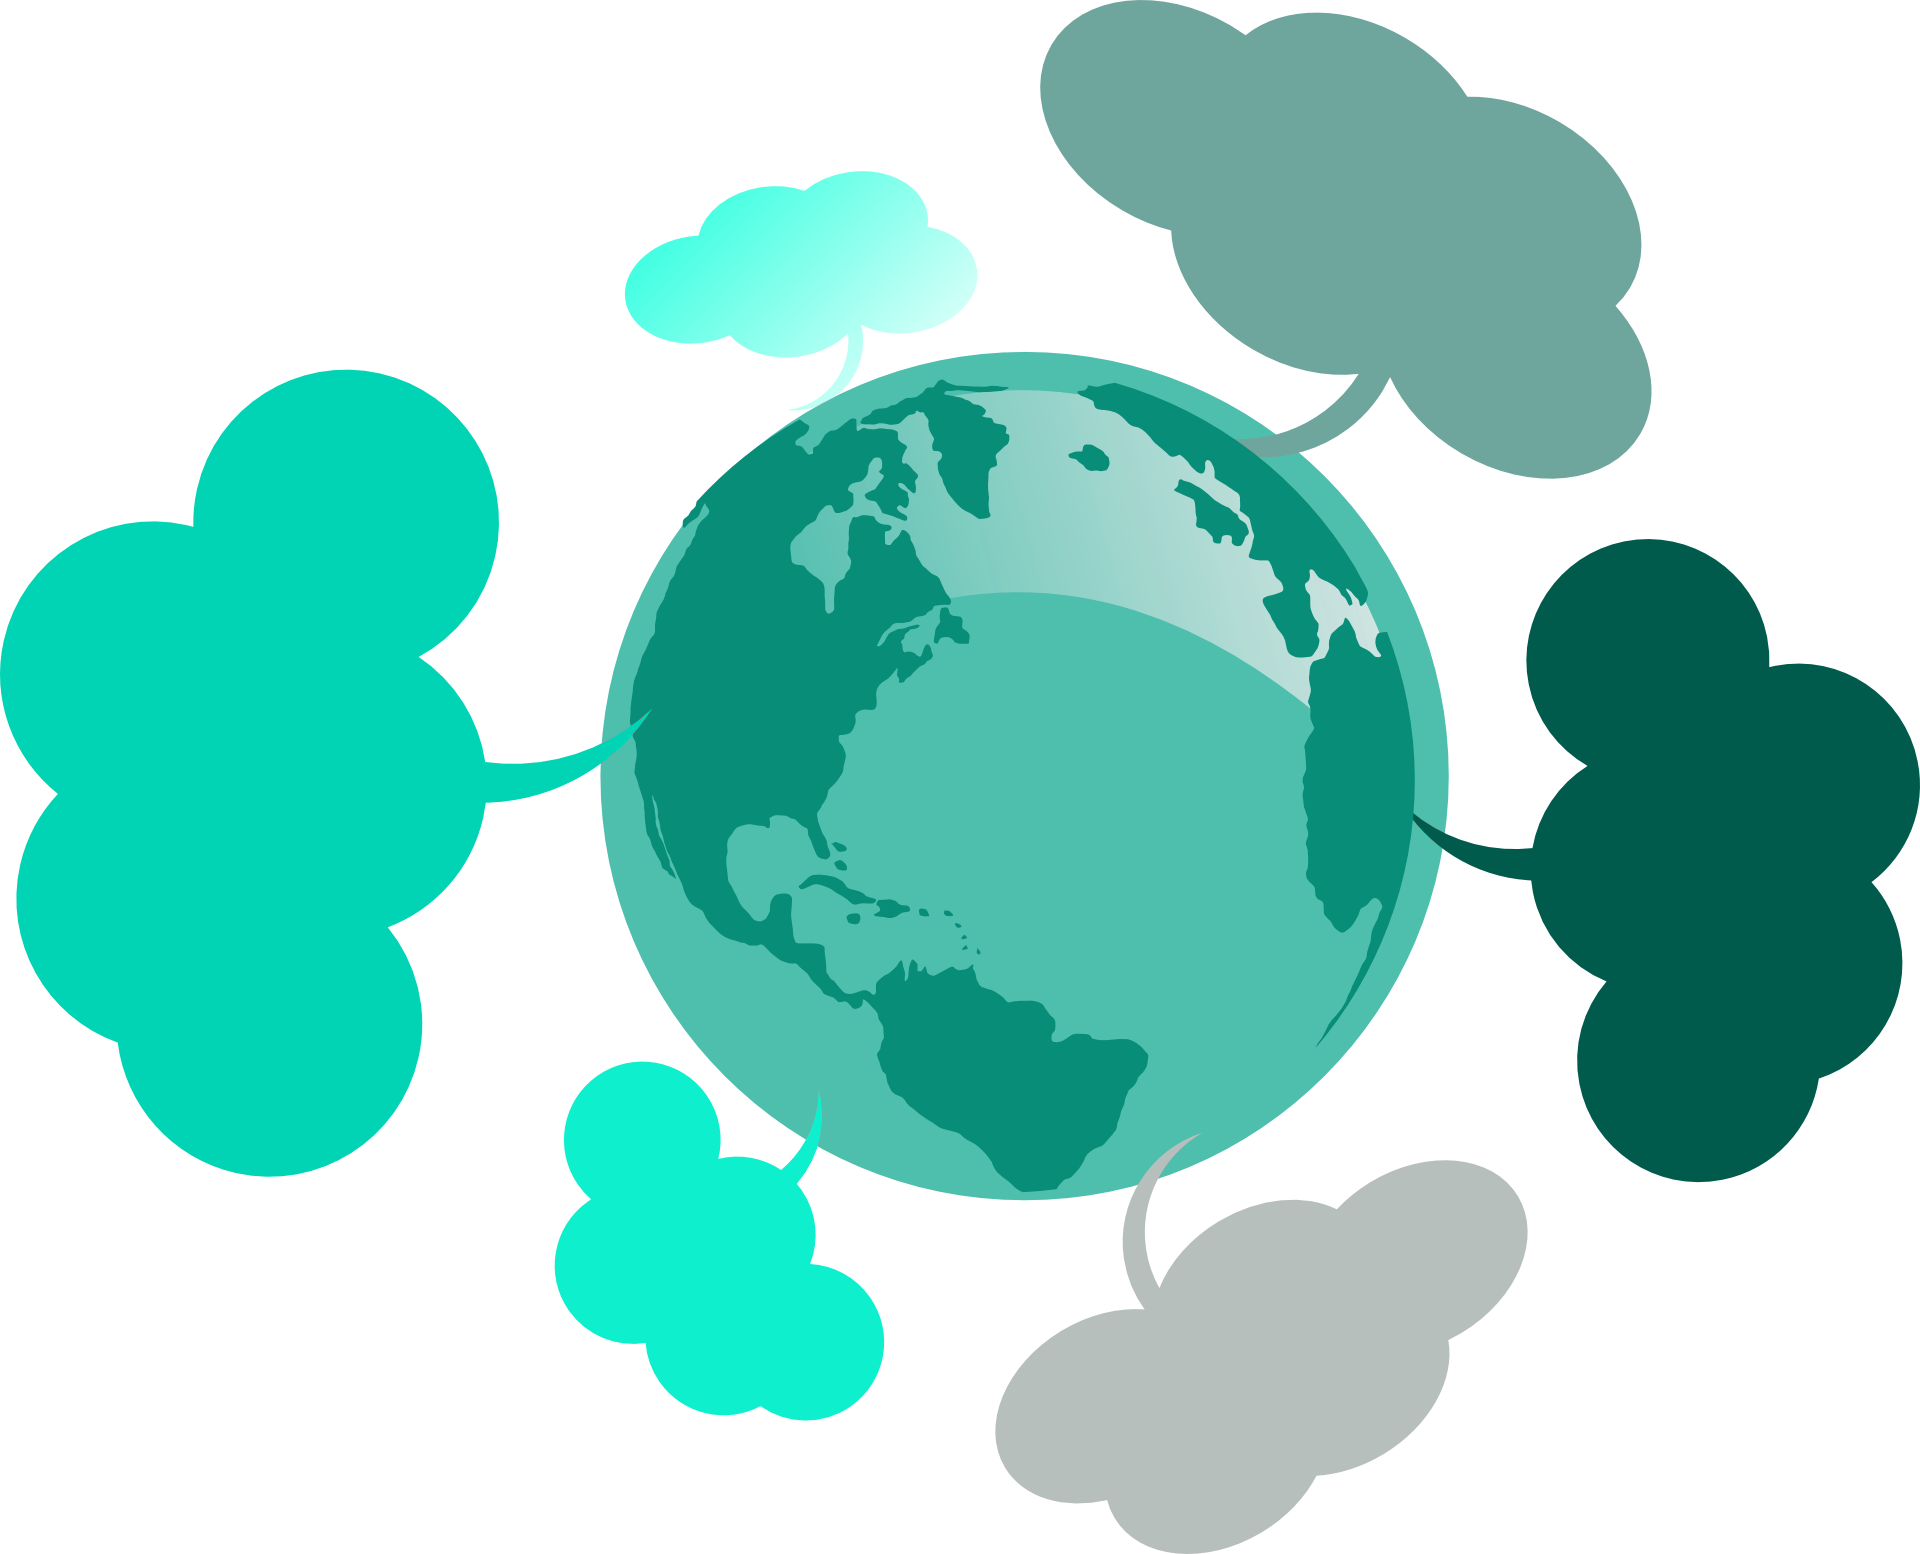 community of the world